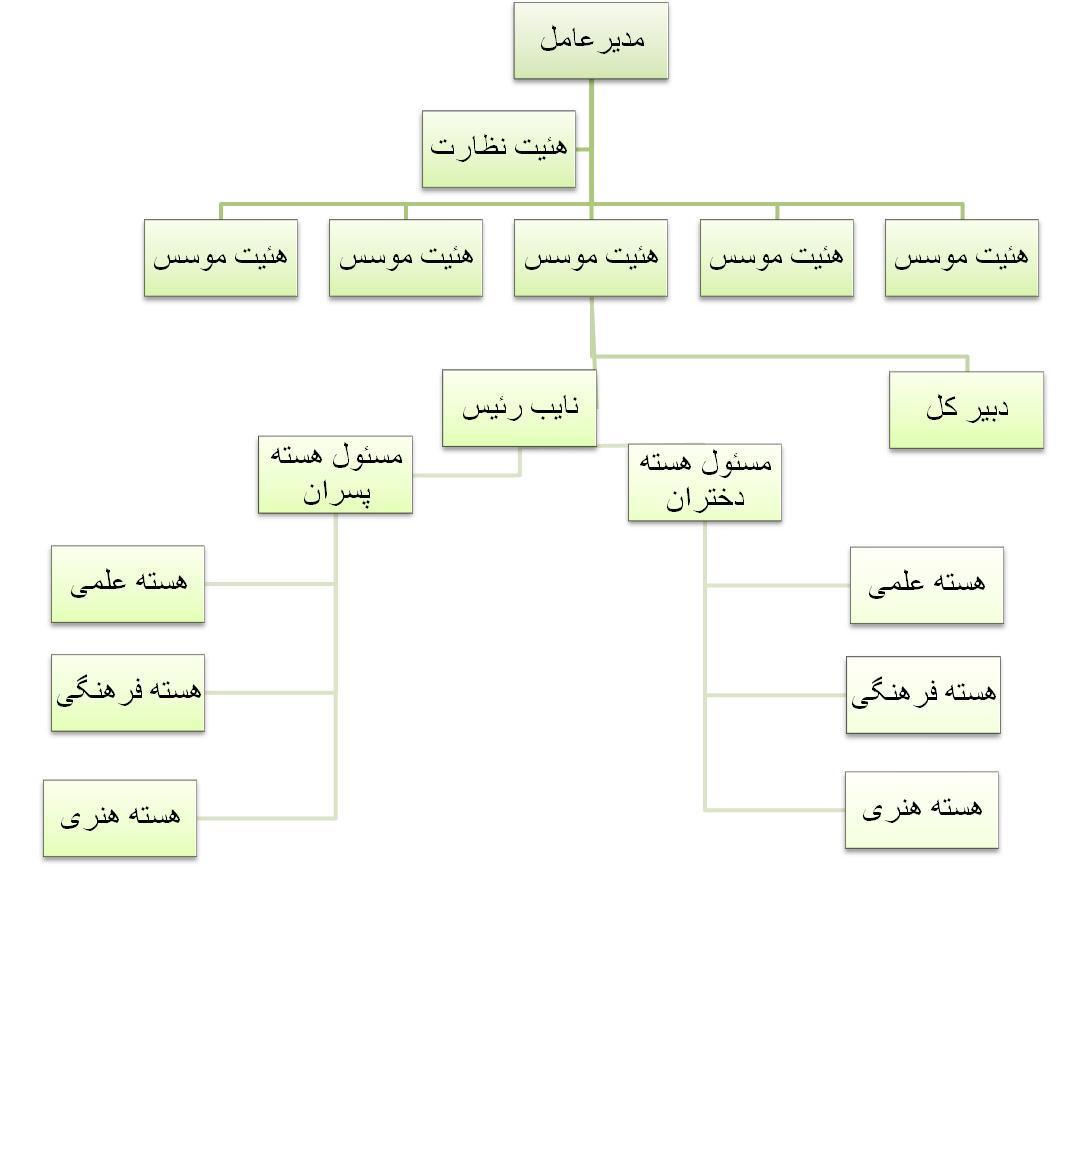 untitled - الگوریتمی از مدل و چارت سازمان های مختلف....*Organization Chart* - متا